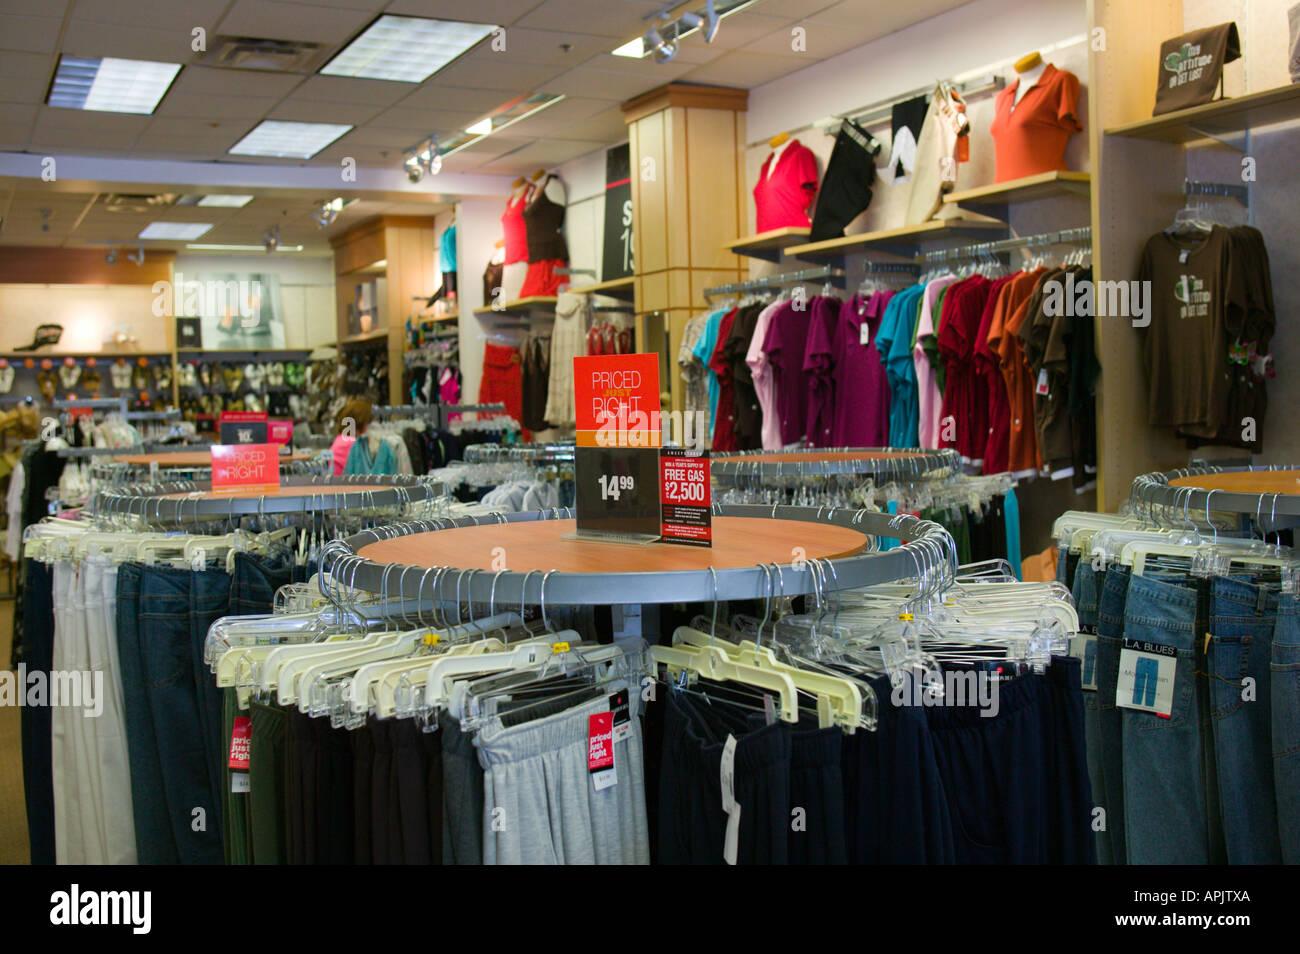 cf8e18dd9930 Interior of Women s Retail Clothing Store Stock Photo: 9032873 - Alamy